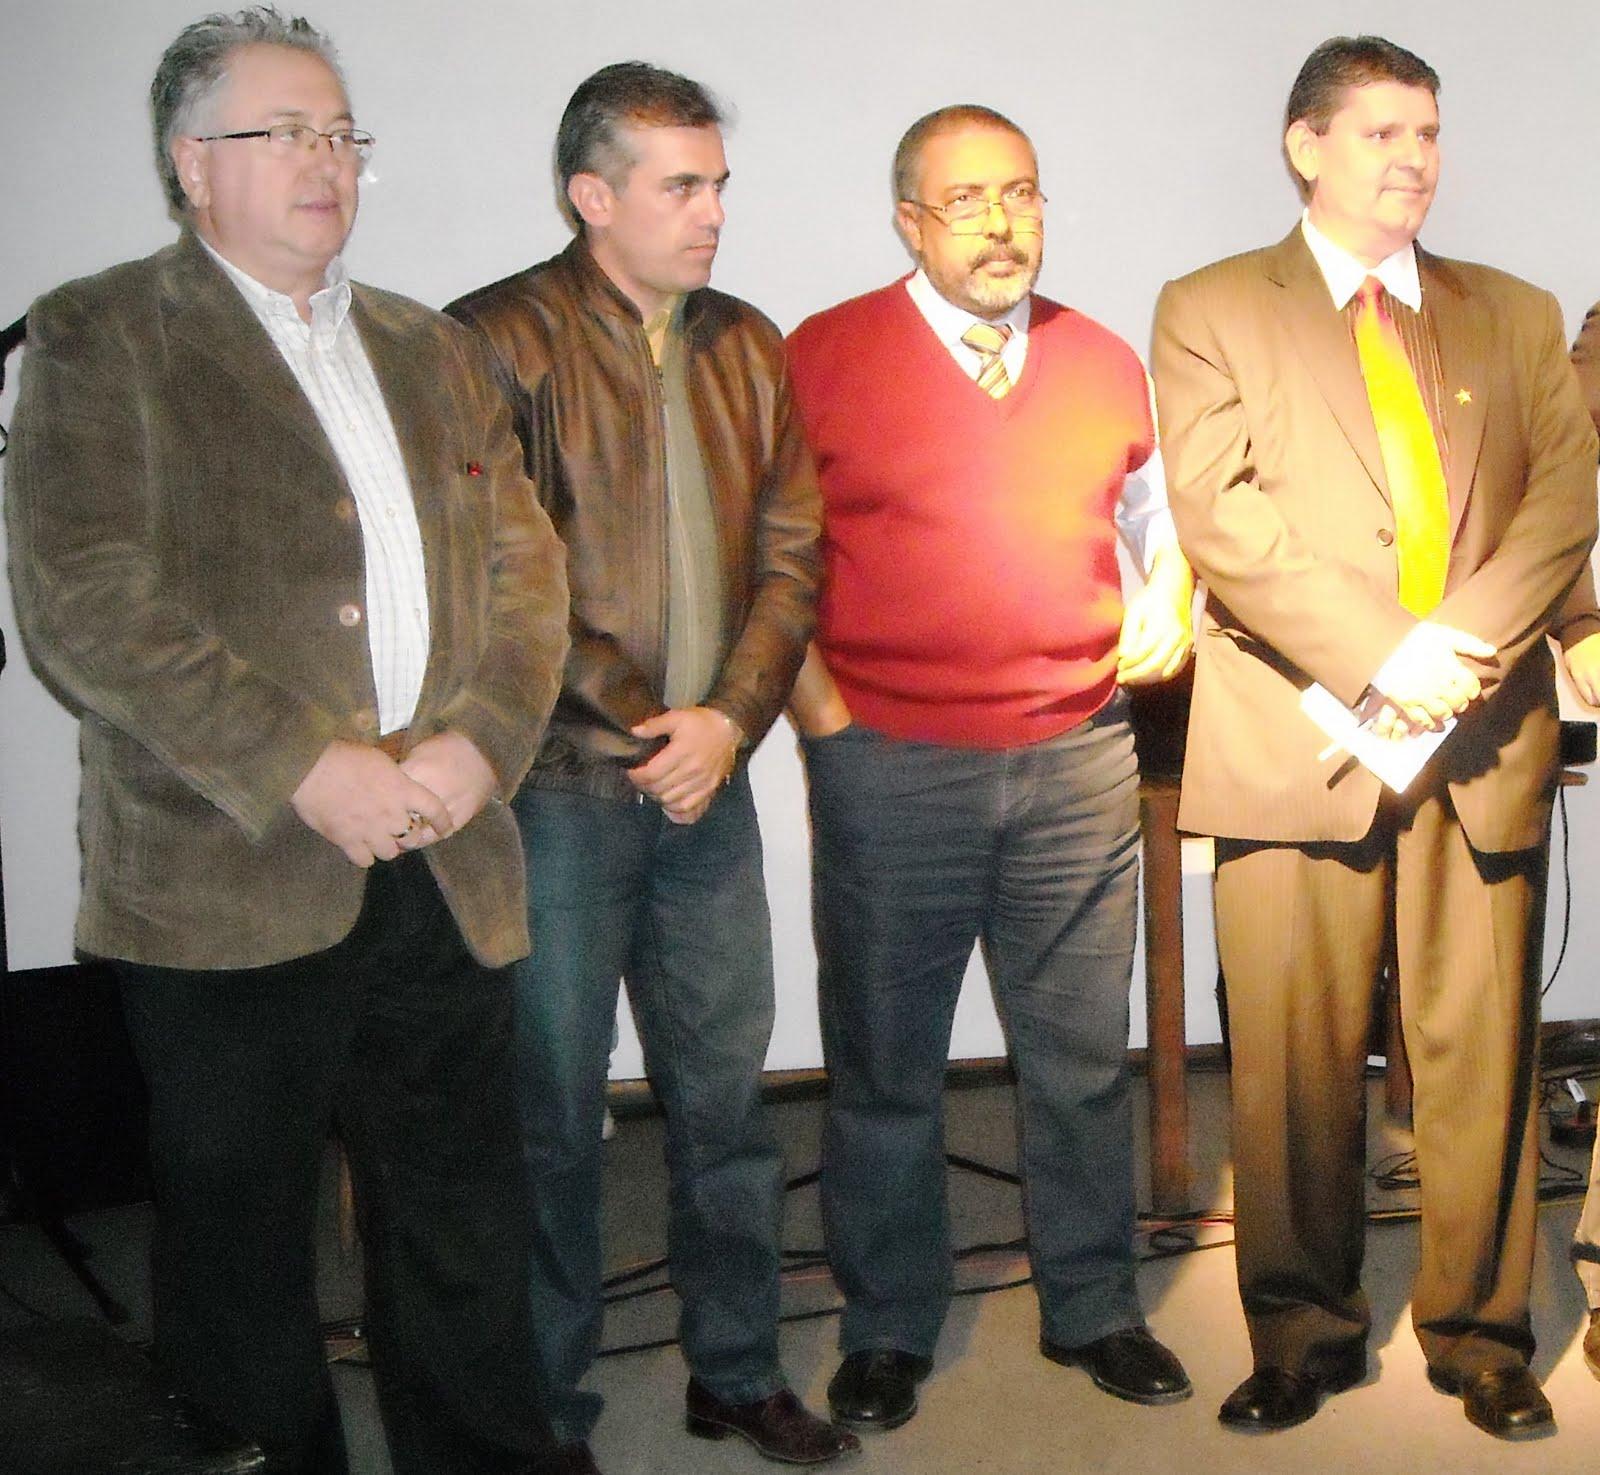 http://1.bp.blogspot.com/_mJEdqllfyL8/S-hyB-UjOQI/AAAAAAAAByI/HwvozVofrGU/s1600/emir+sade_santa+cruz+047.jpg